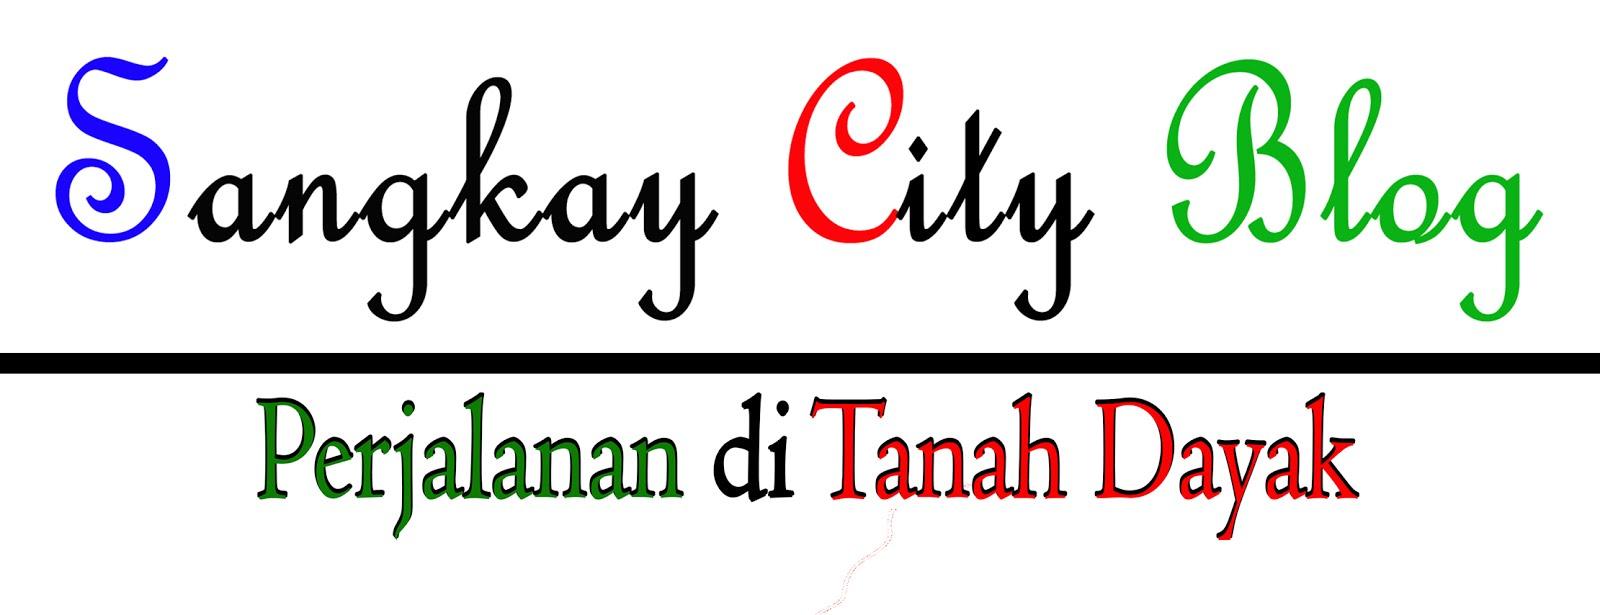 Sangkay City